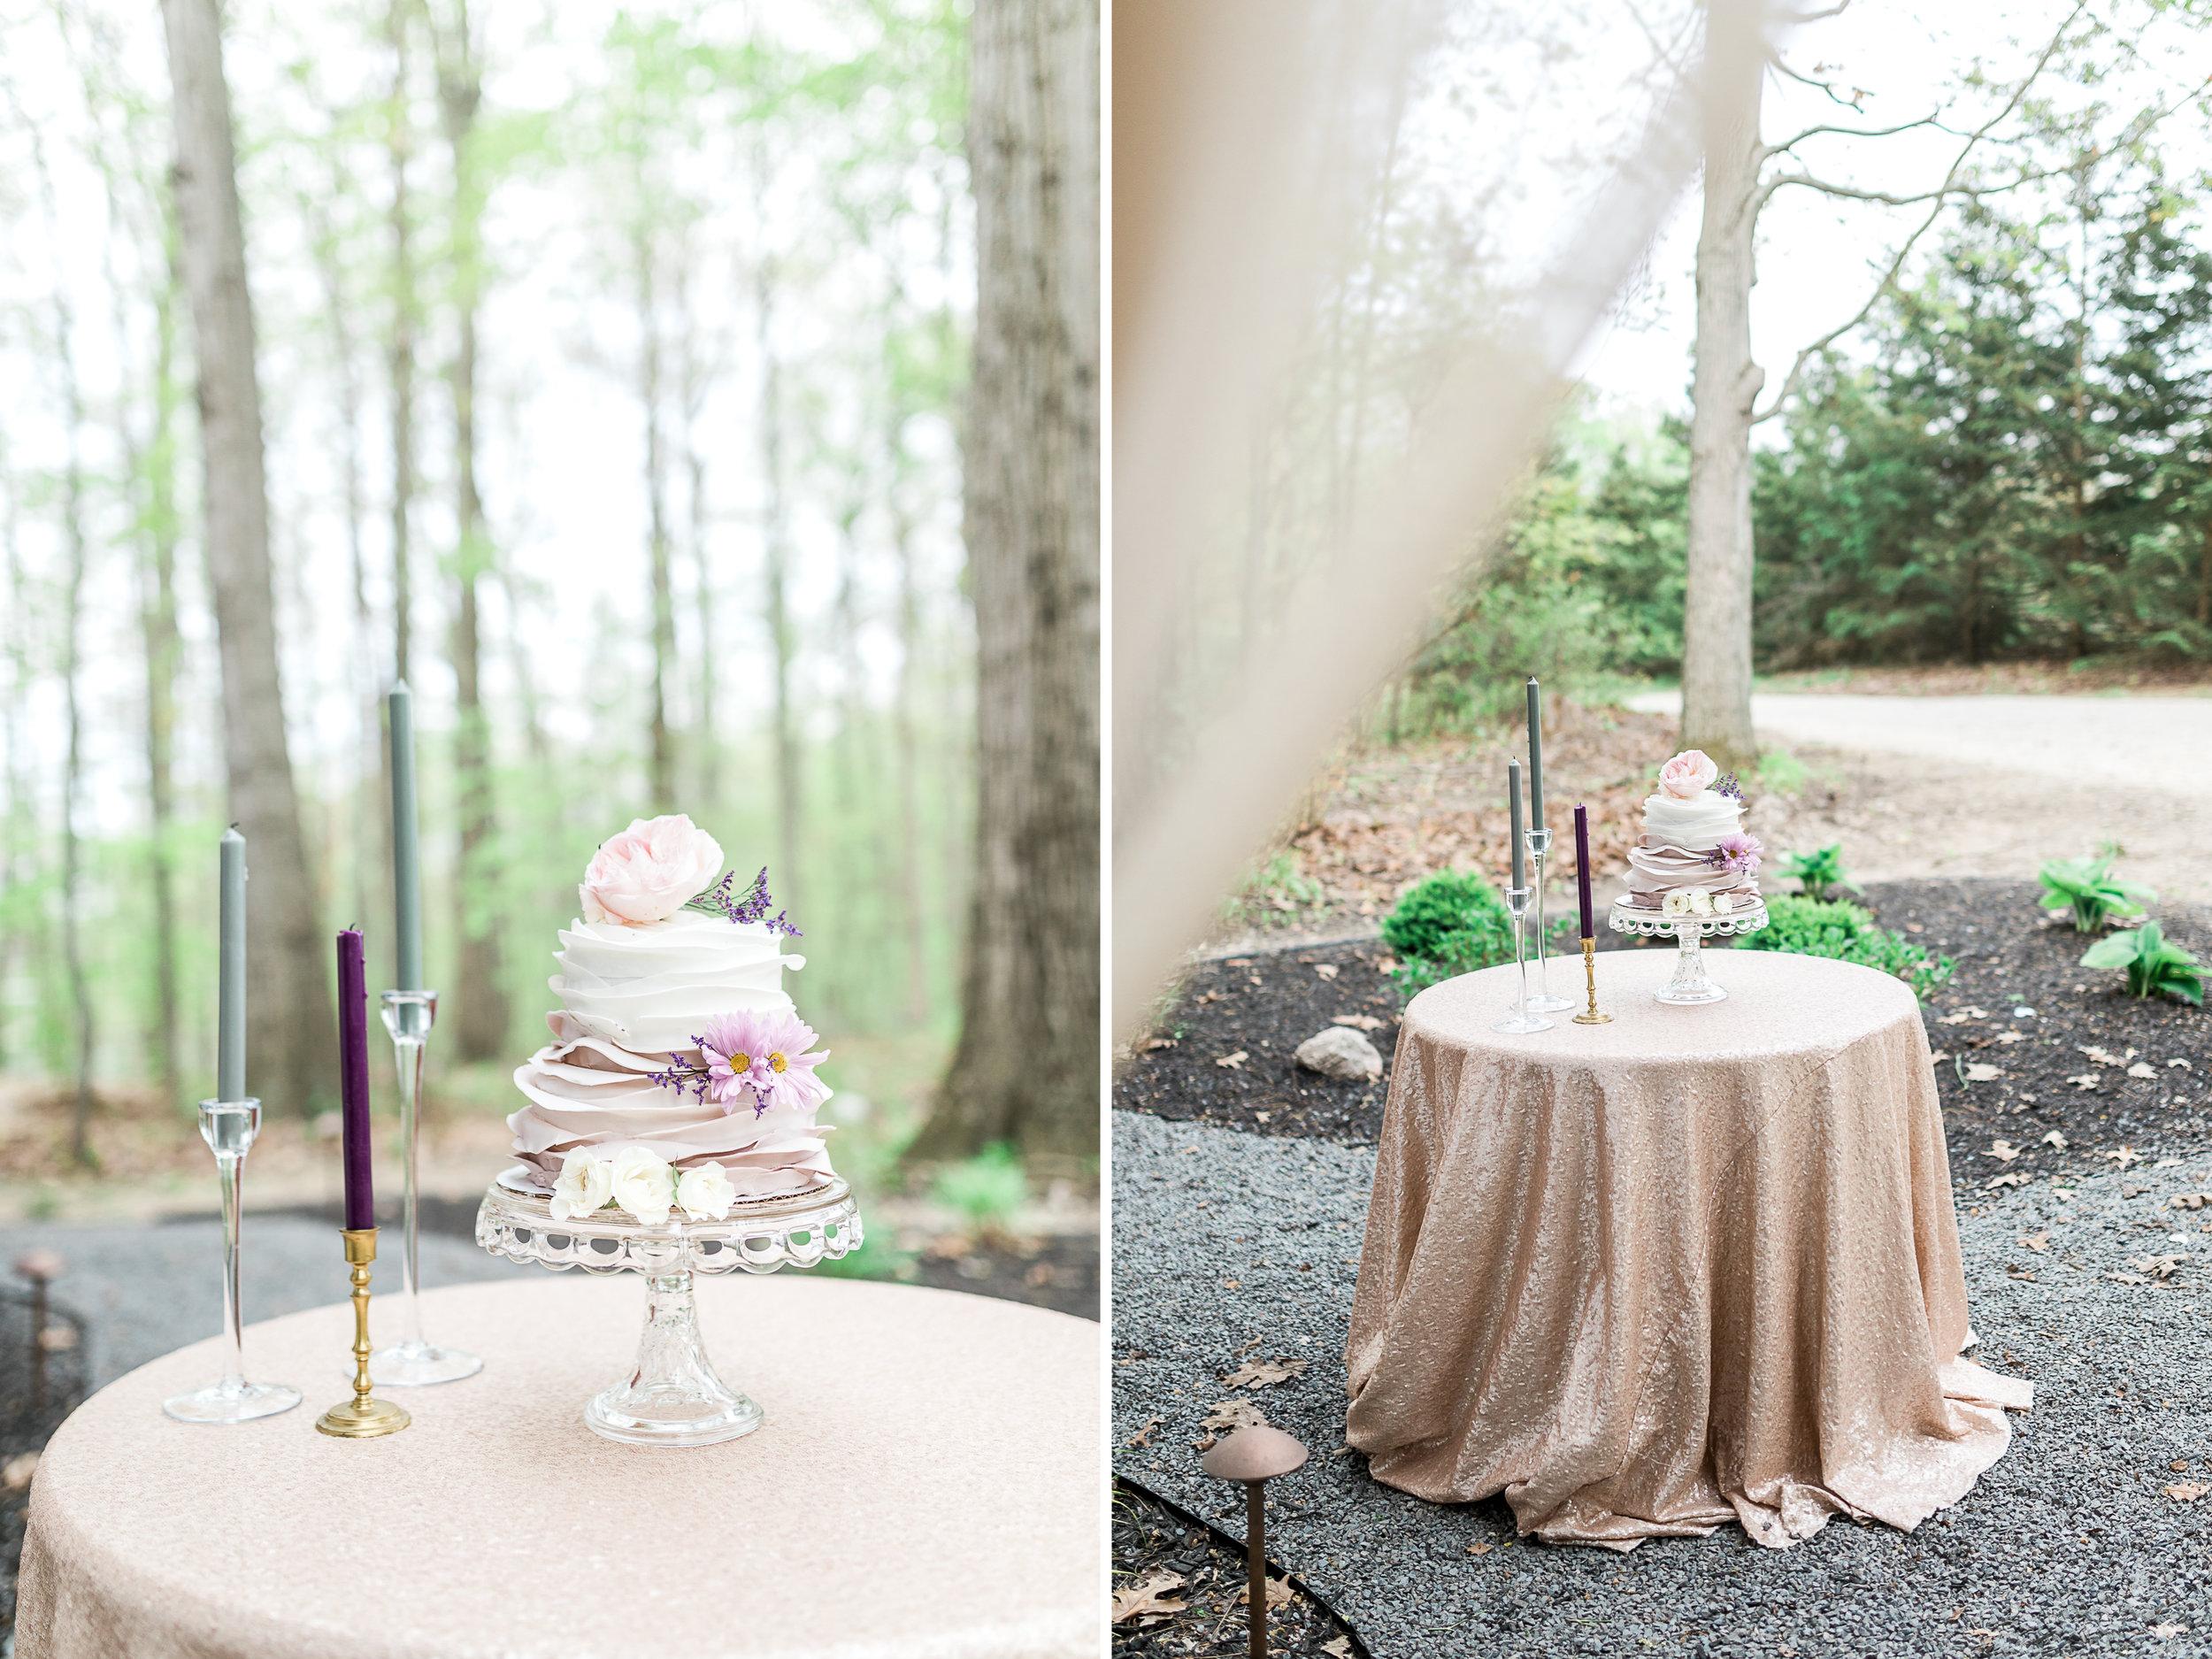 Ruffle Wedding Cake | Styled Wedding Shoot at Gable Hill Barn | Elegant Chic Wedding | Laurenda Marie Photography | West Michigan Wedding Photographer |